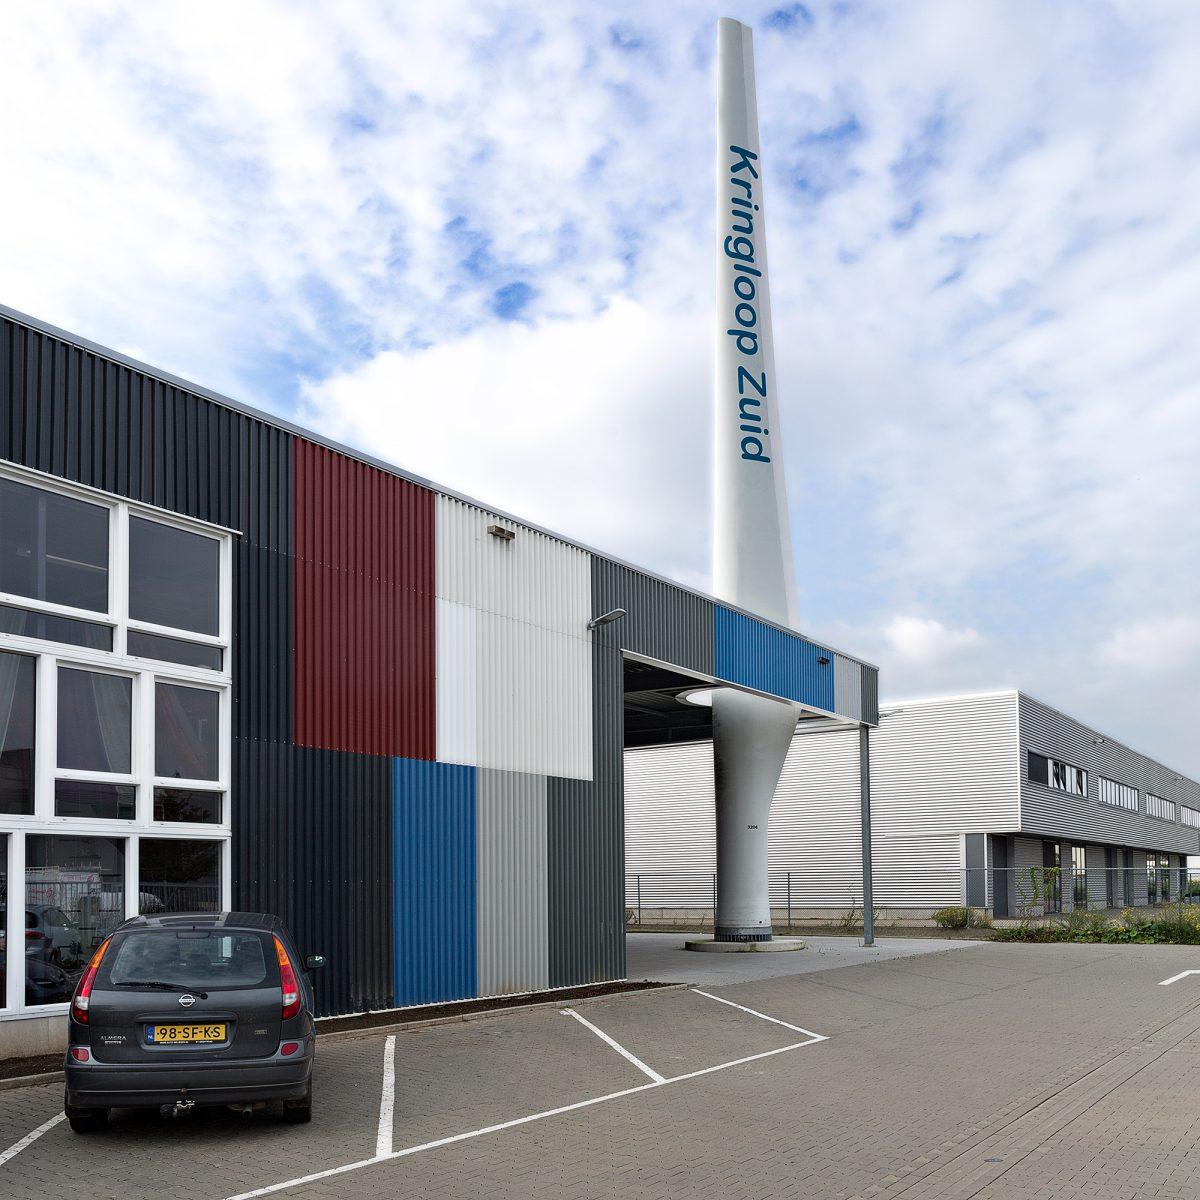 Kringloop Zuid Maastricht